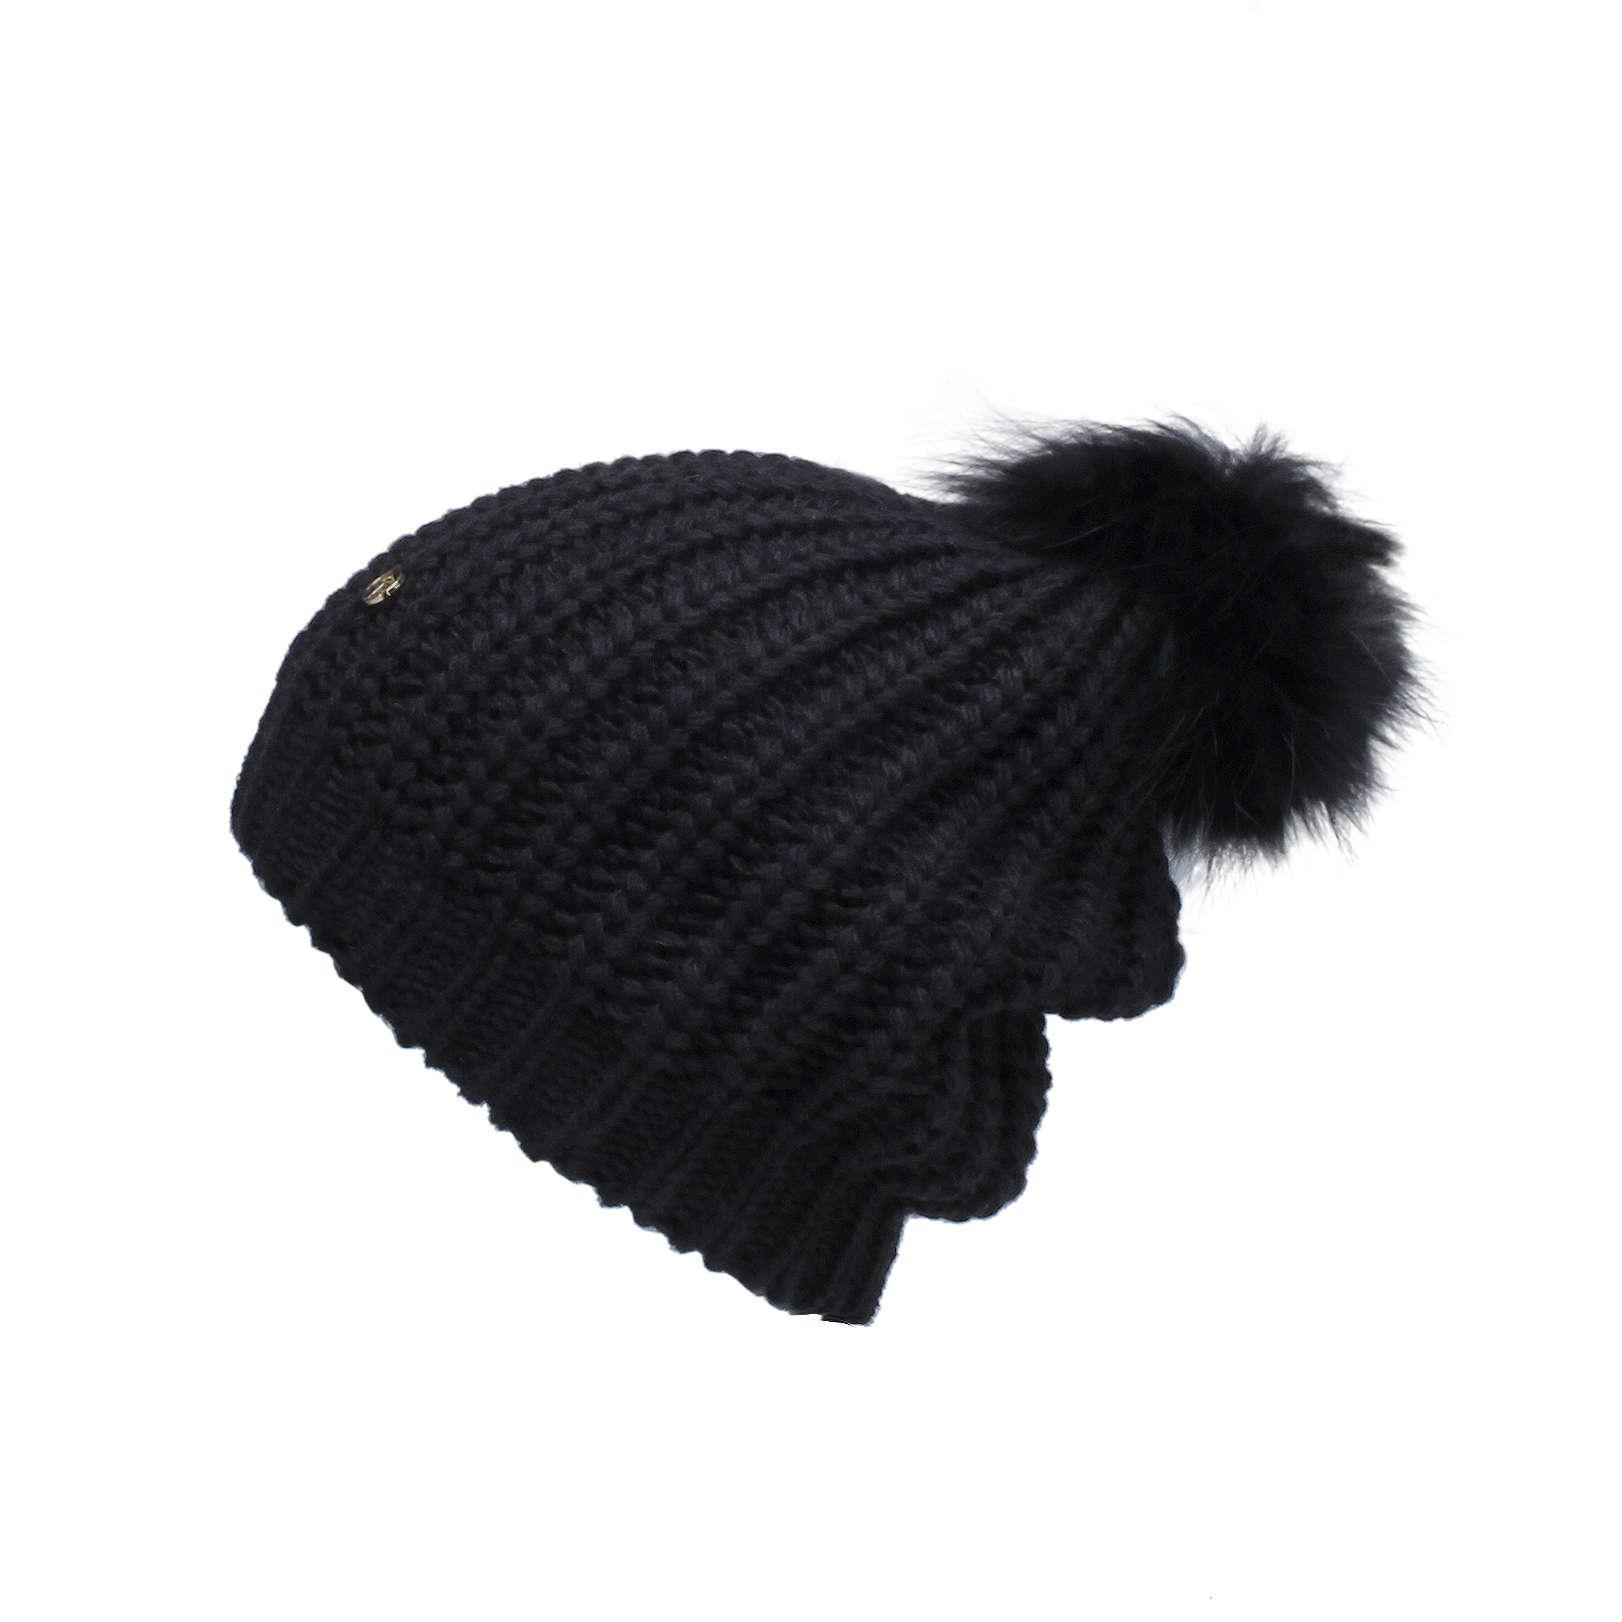 bcd4612ed Kurt Geiger Fur Pom Pom Hat In Black